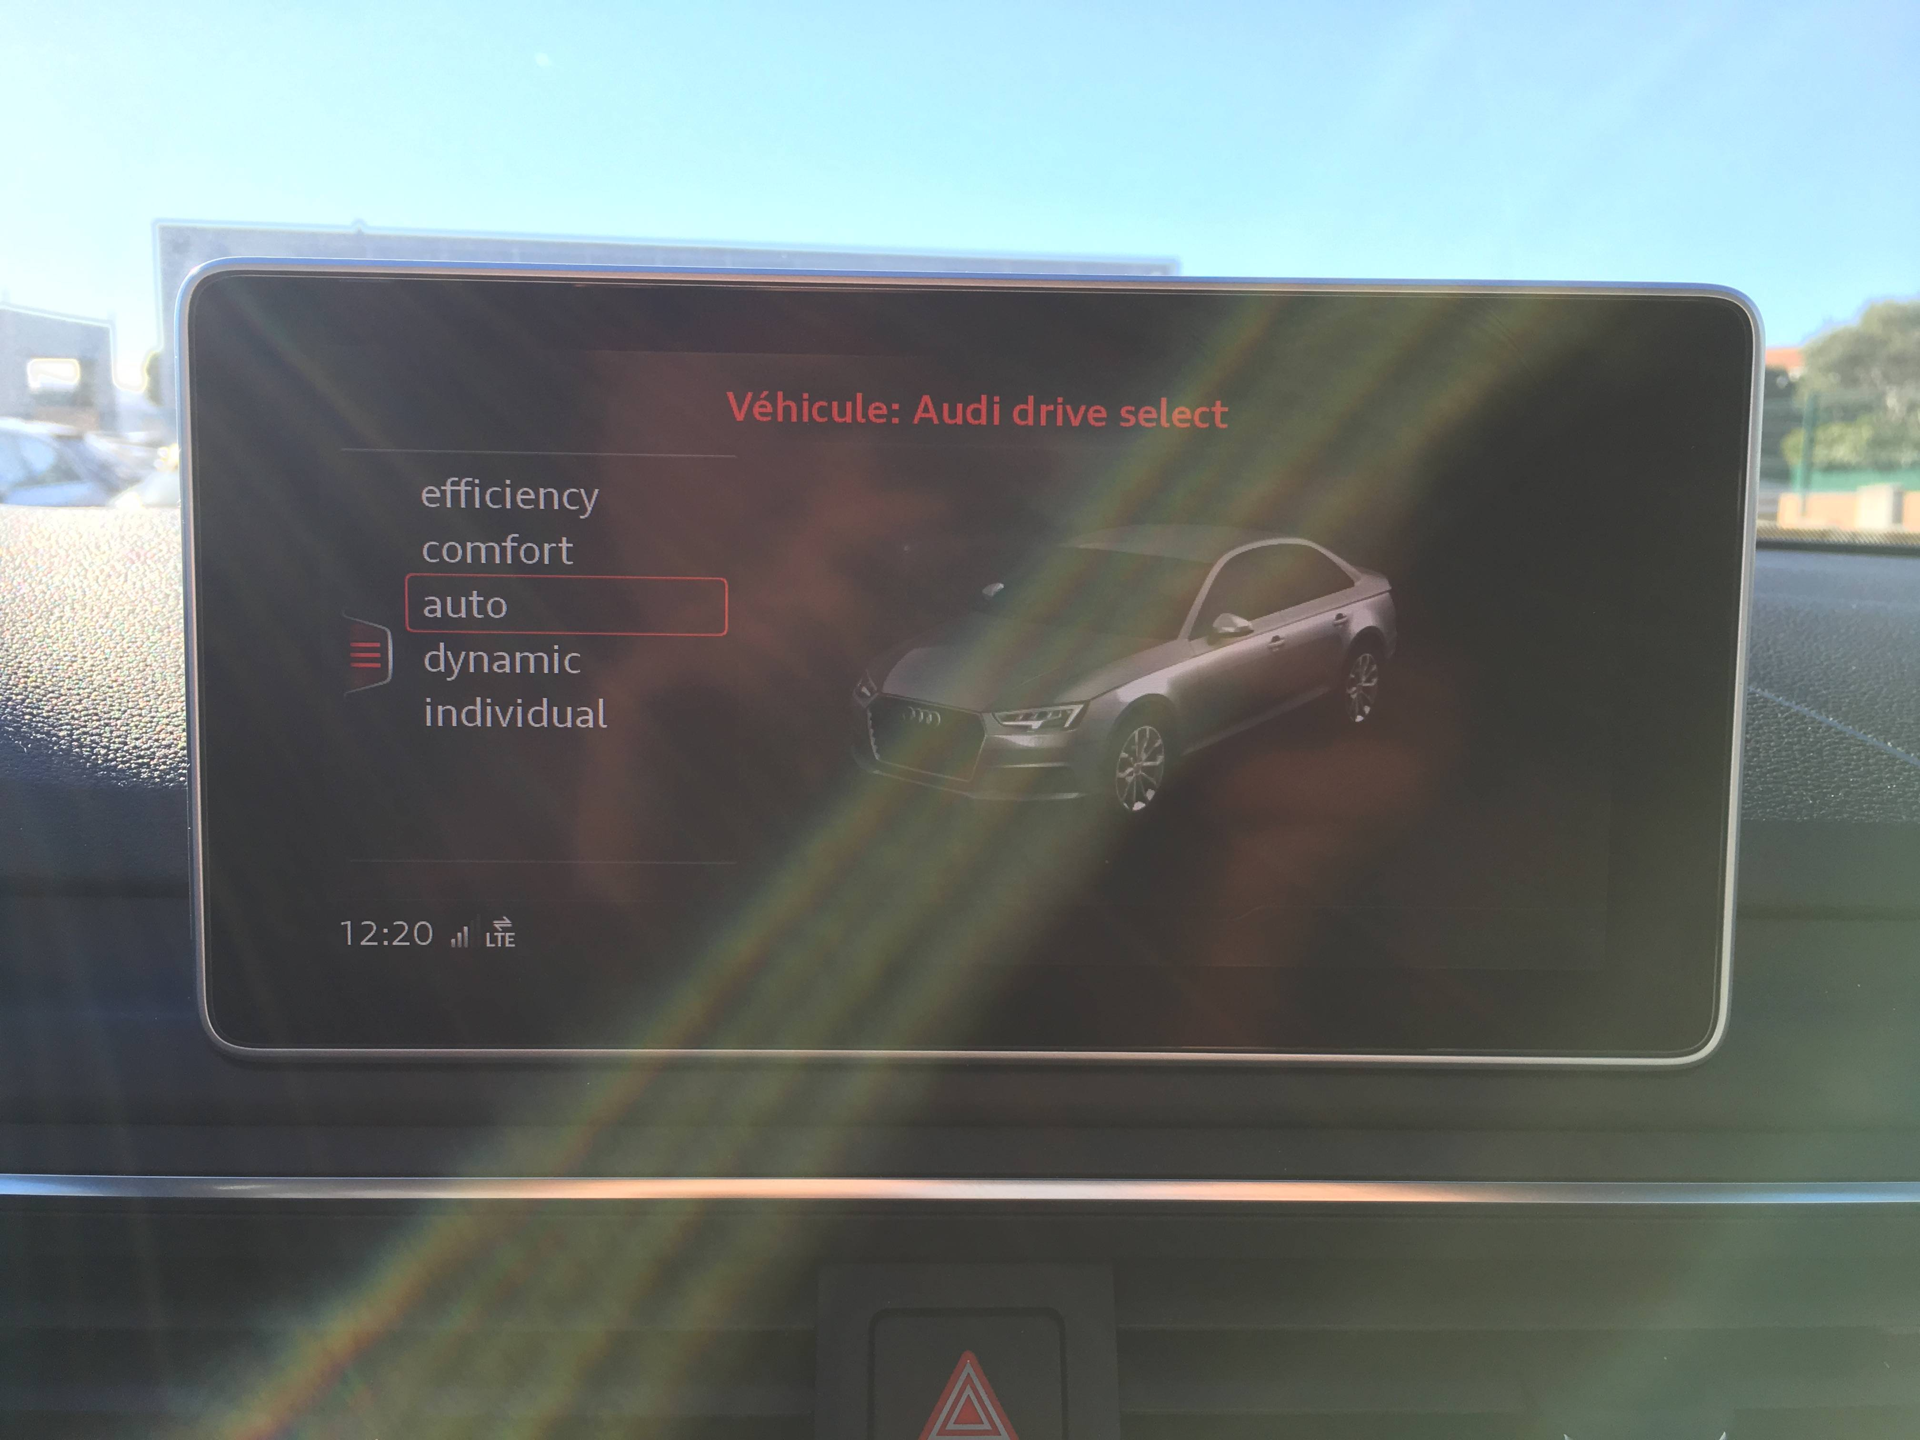 A4 2.0 TDI 190 S tronic 7 Quattro